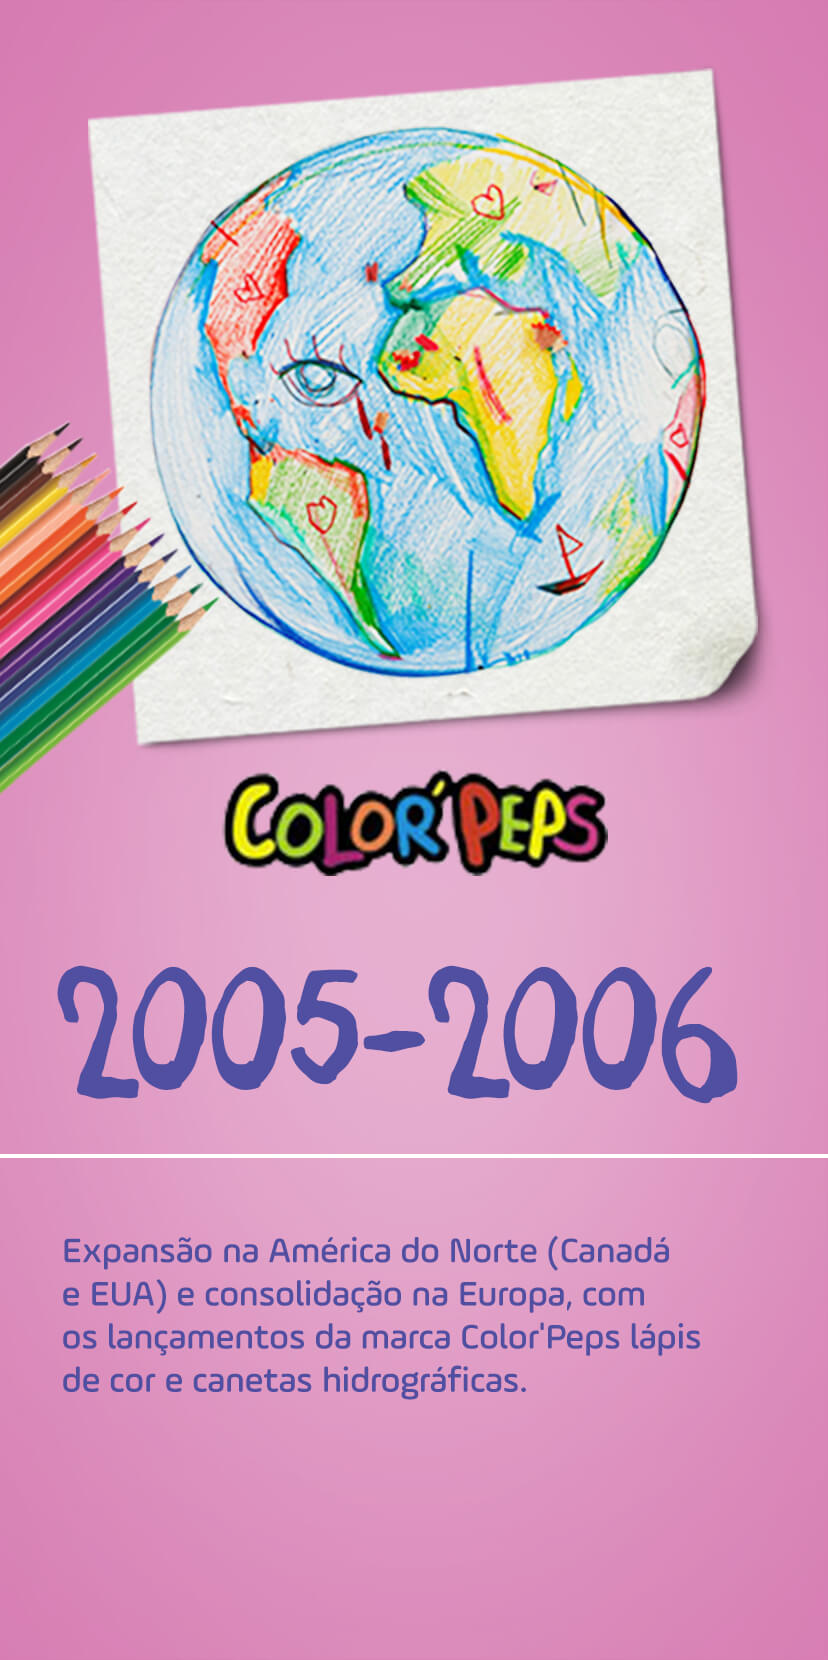 06 mobile 2005 2006